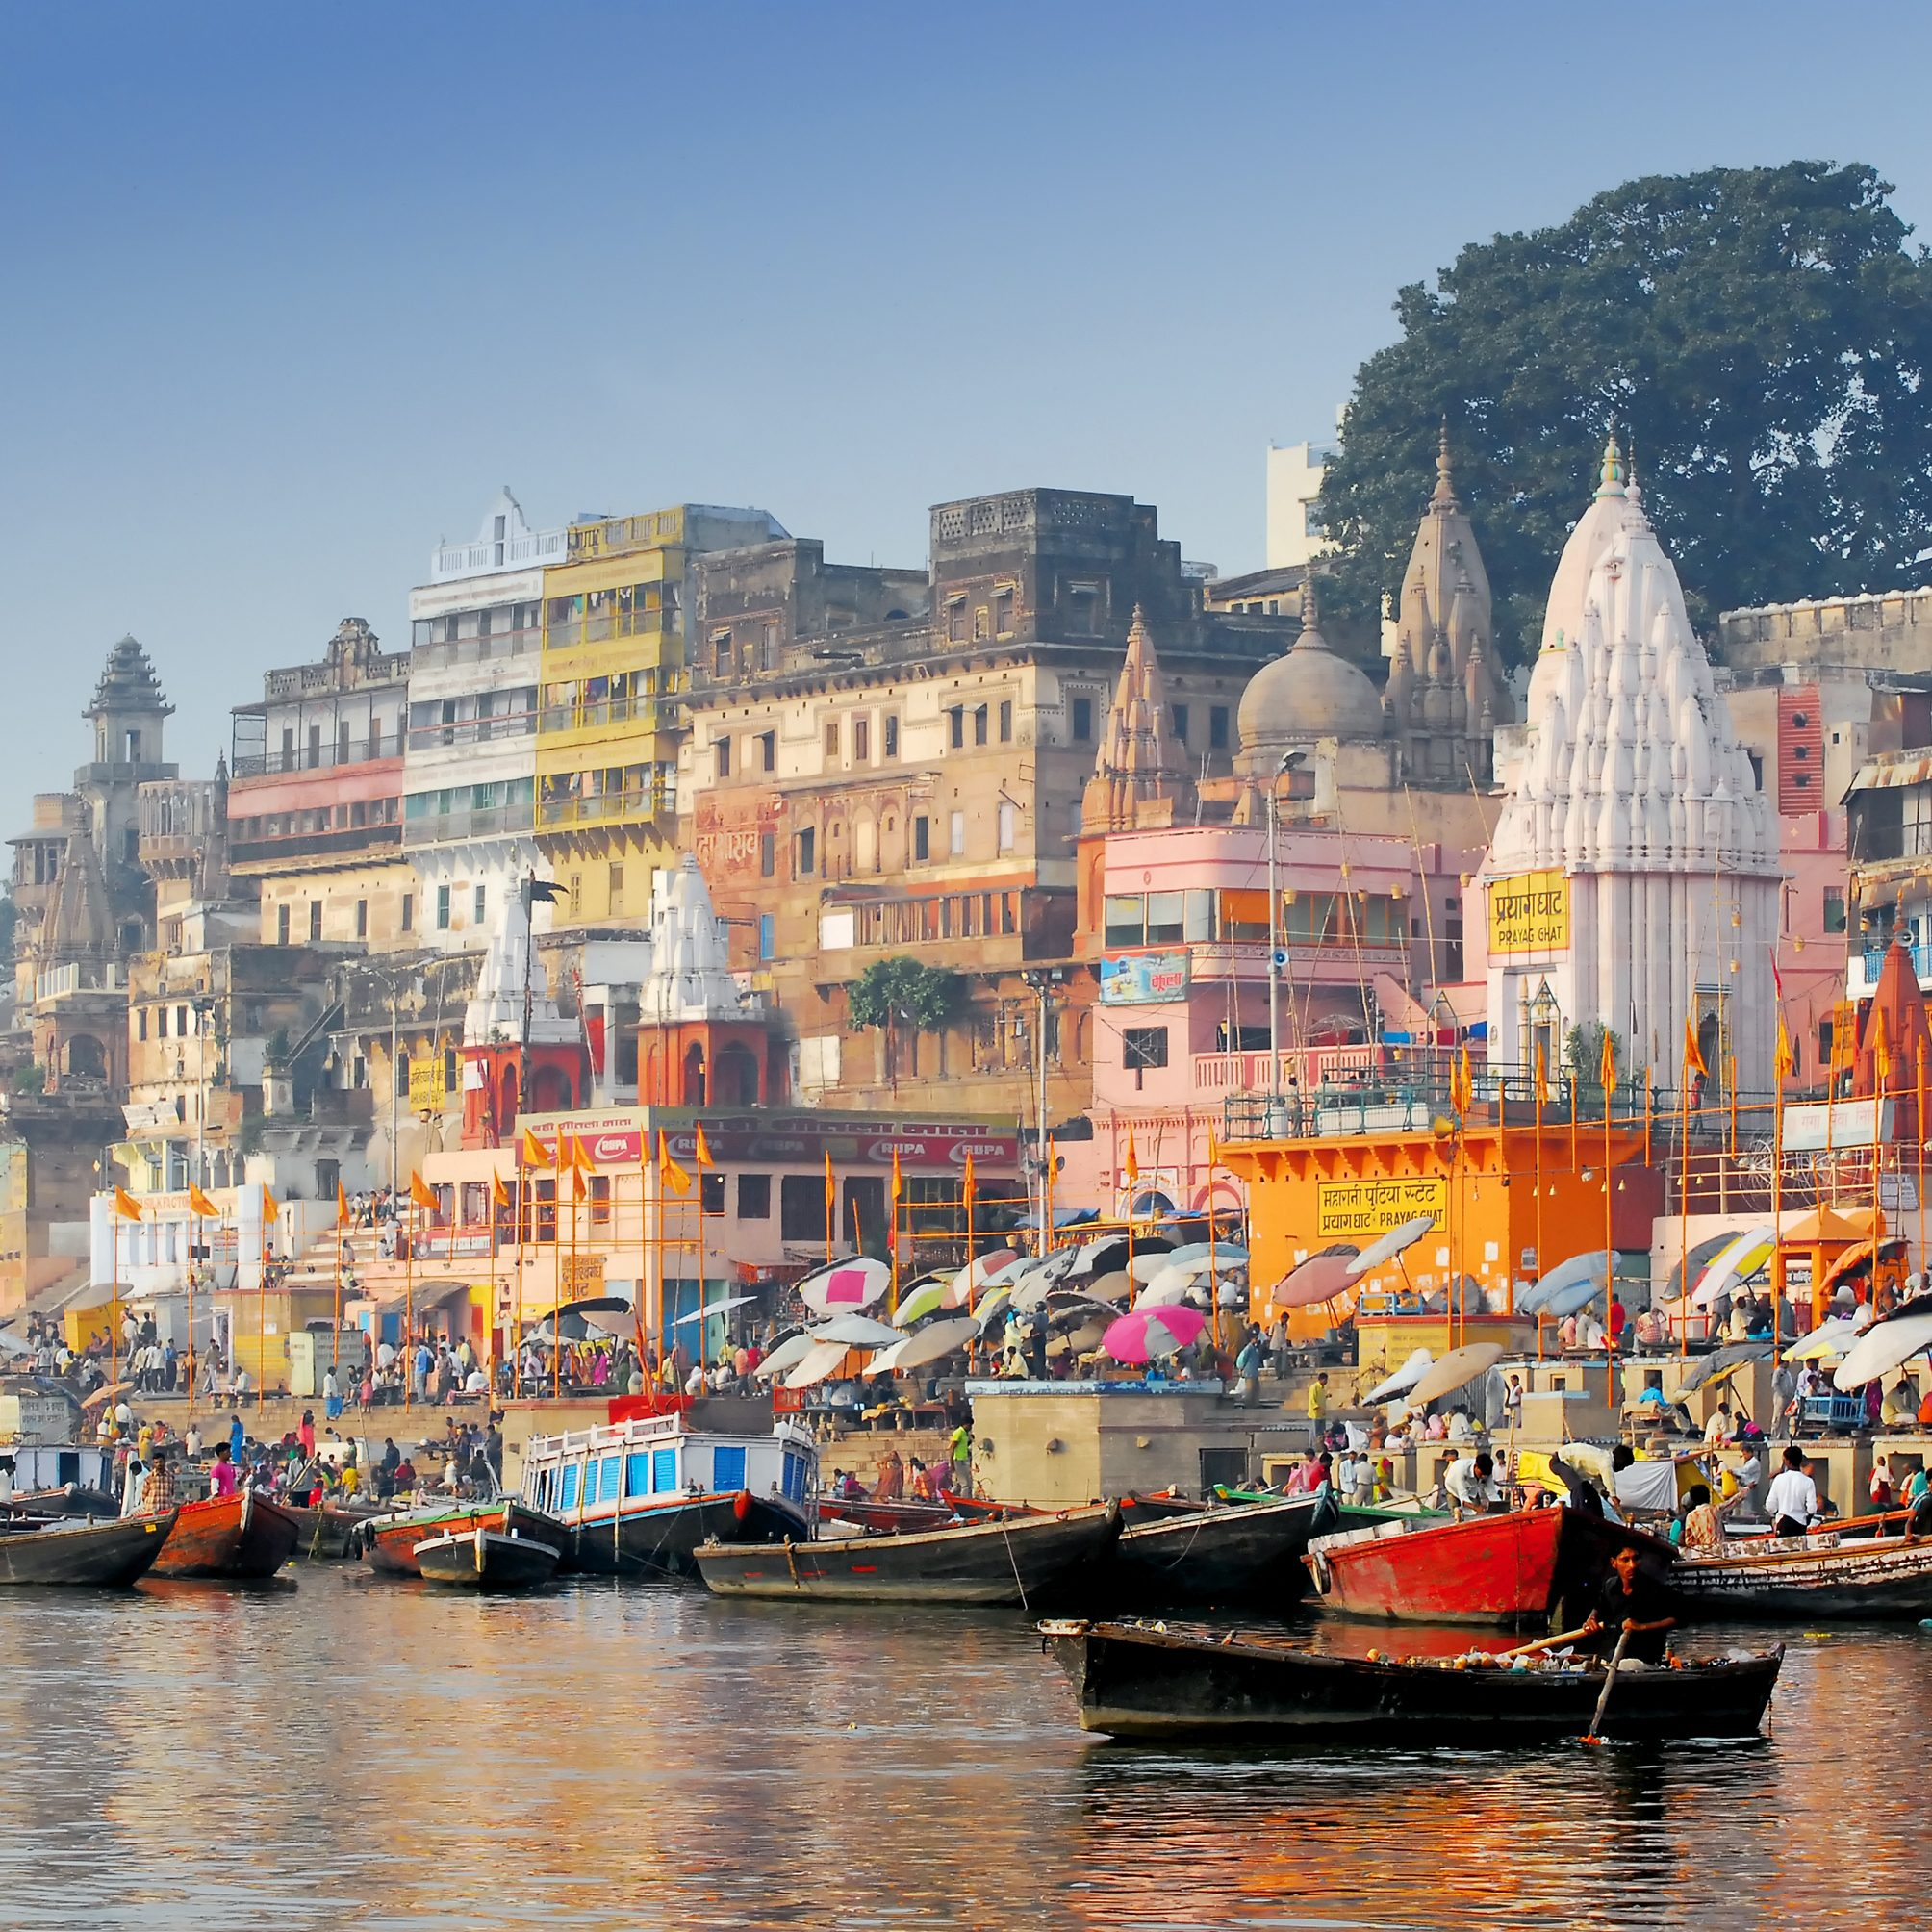 Boats in Varanasi